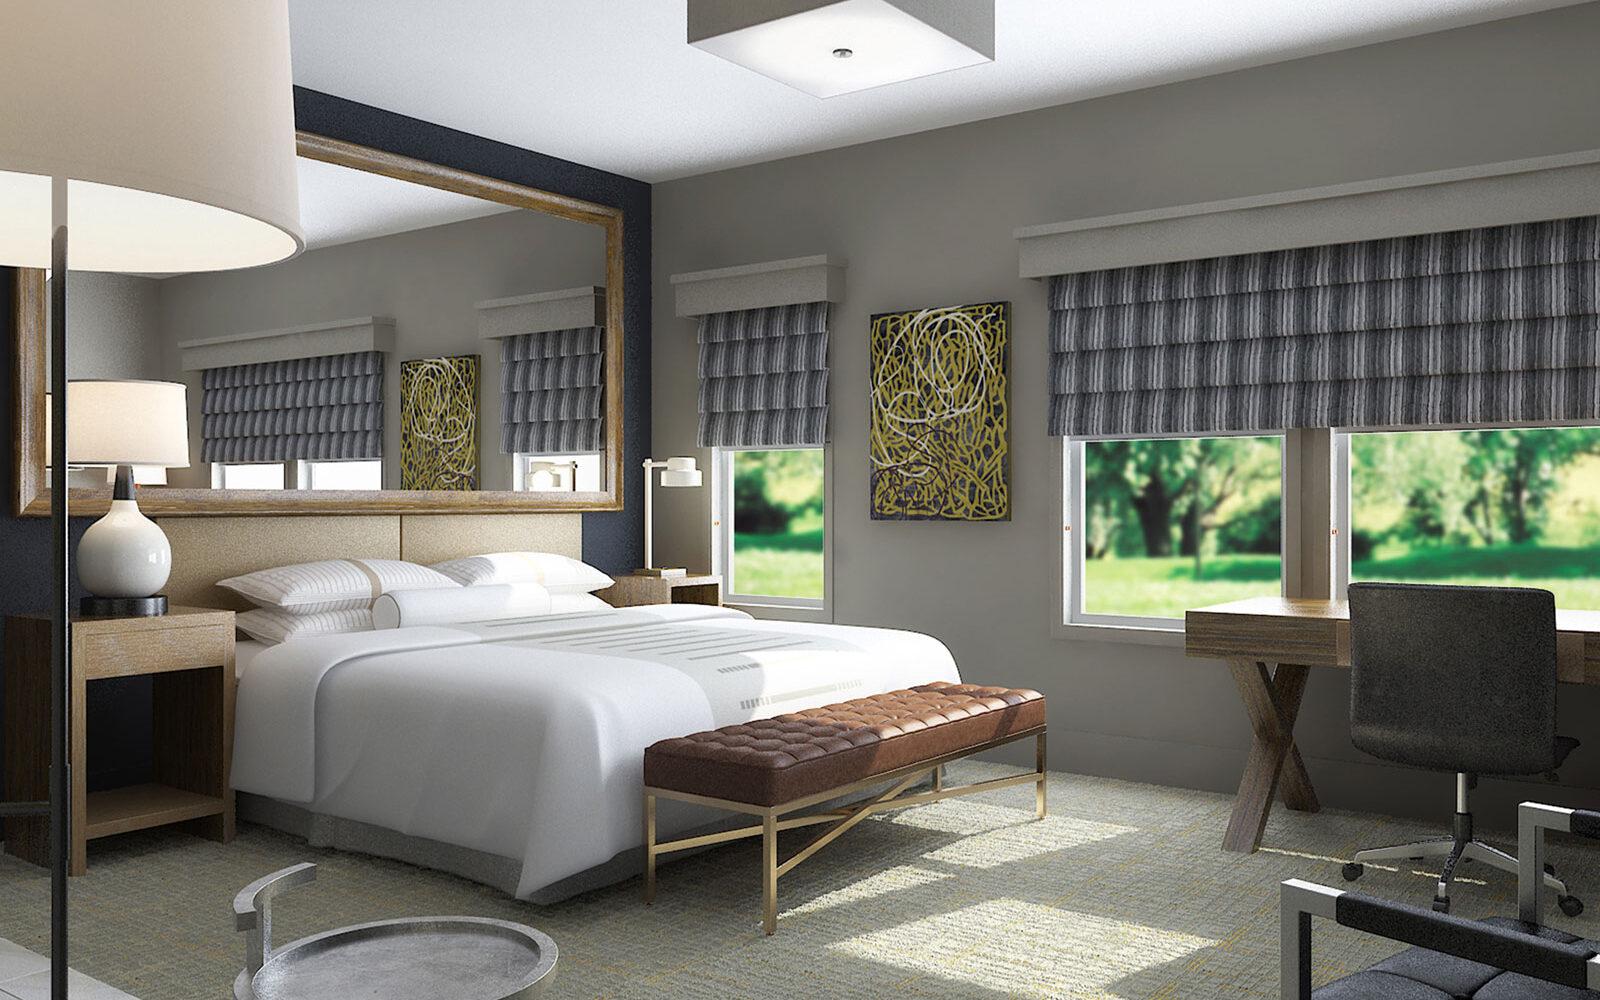 Luxury rooms at Partridge Inn